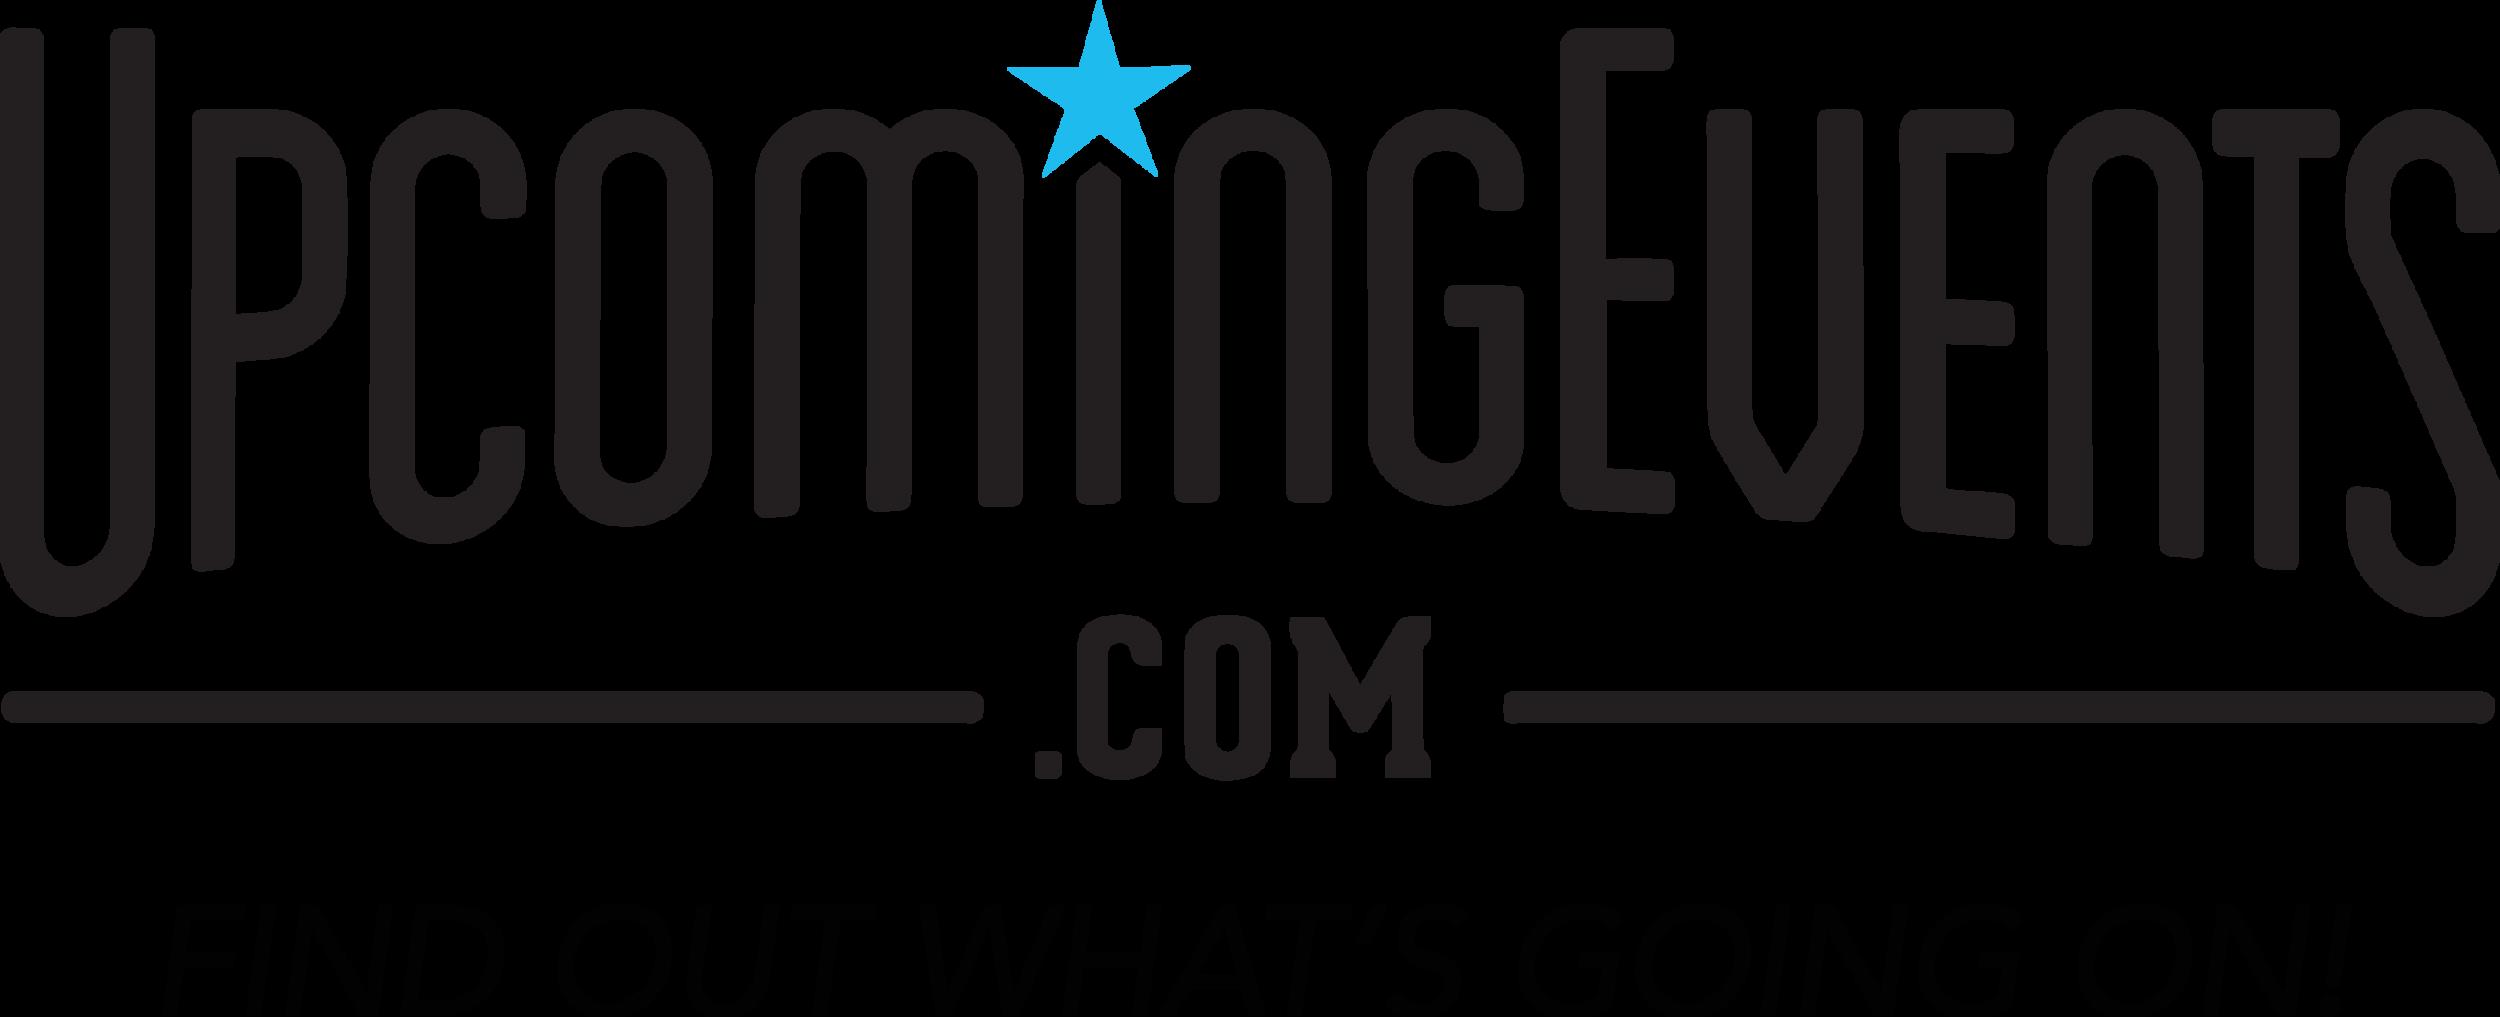 UCE-Logo-TagBottom-BlueStarBlackTagline.png